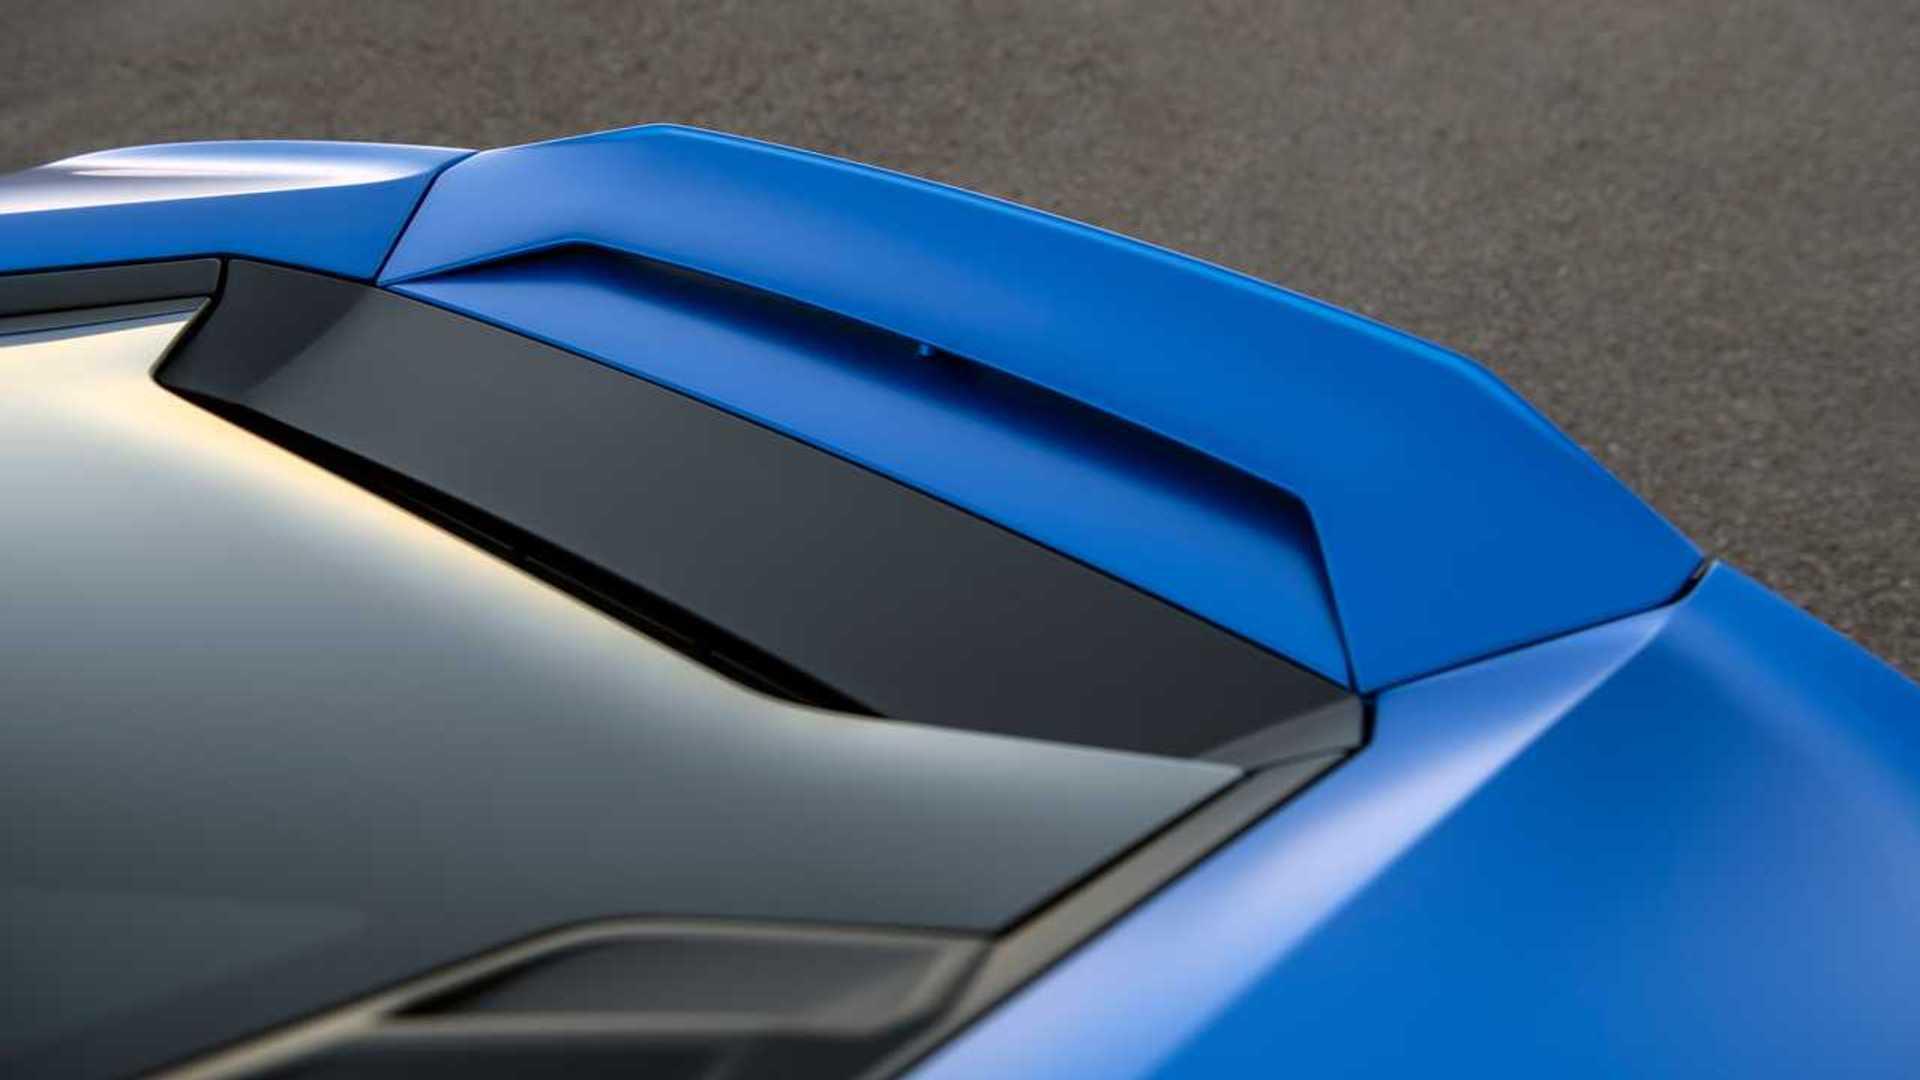 2020 Lamborghini Huracan Evo RWD spoiler